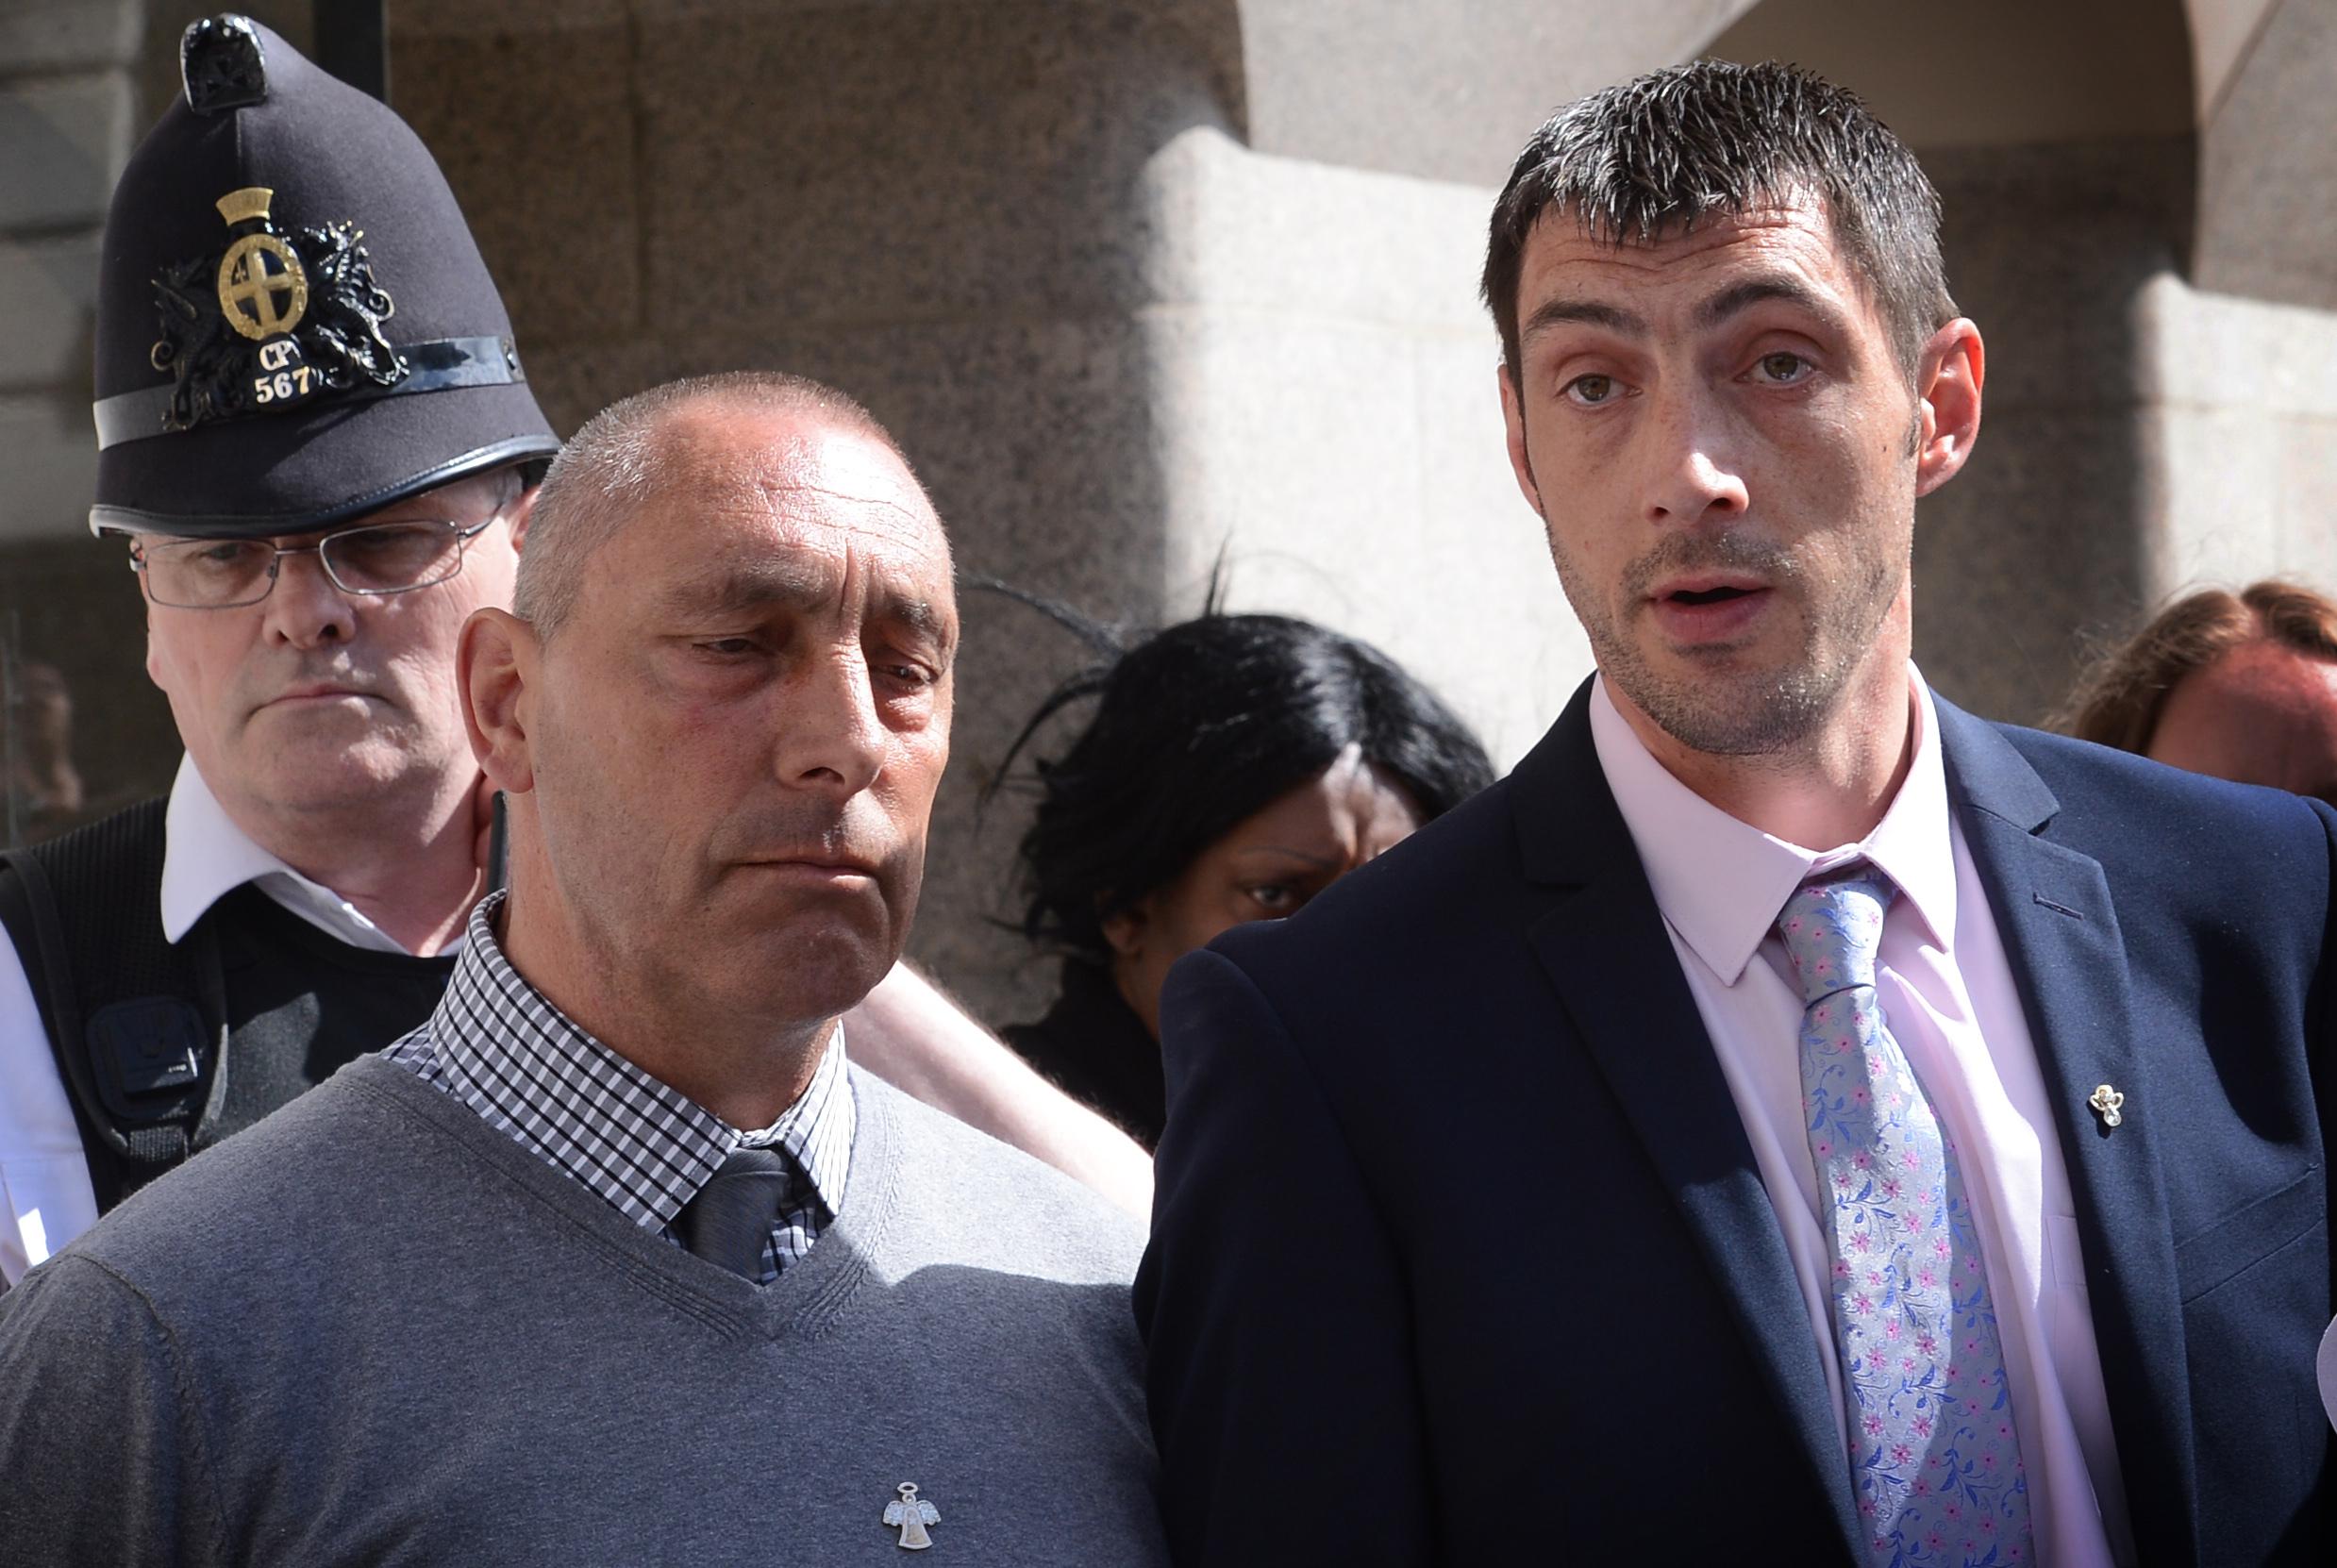 Tia Sharp's father wants murderer Stuart Hazell hanged as mother admits 'pity'